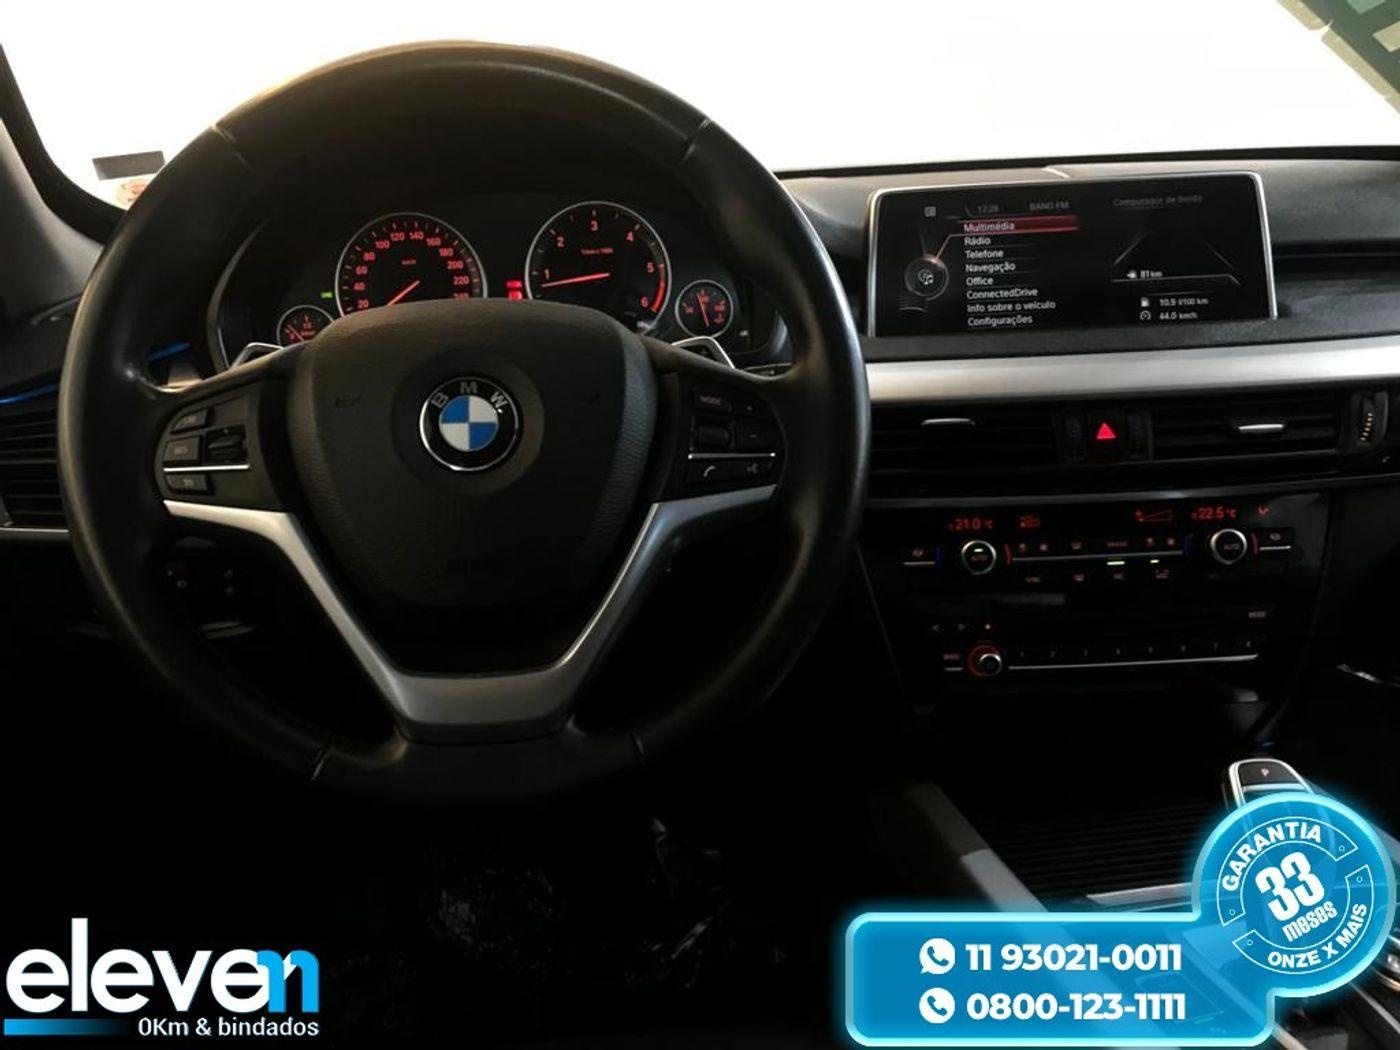 BMW X5 XDRIVE 30d 3.0 258cv Diesel